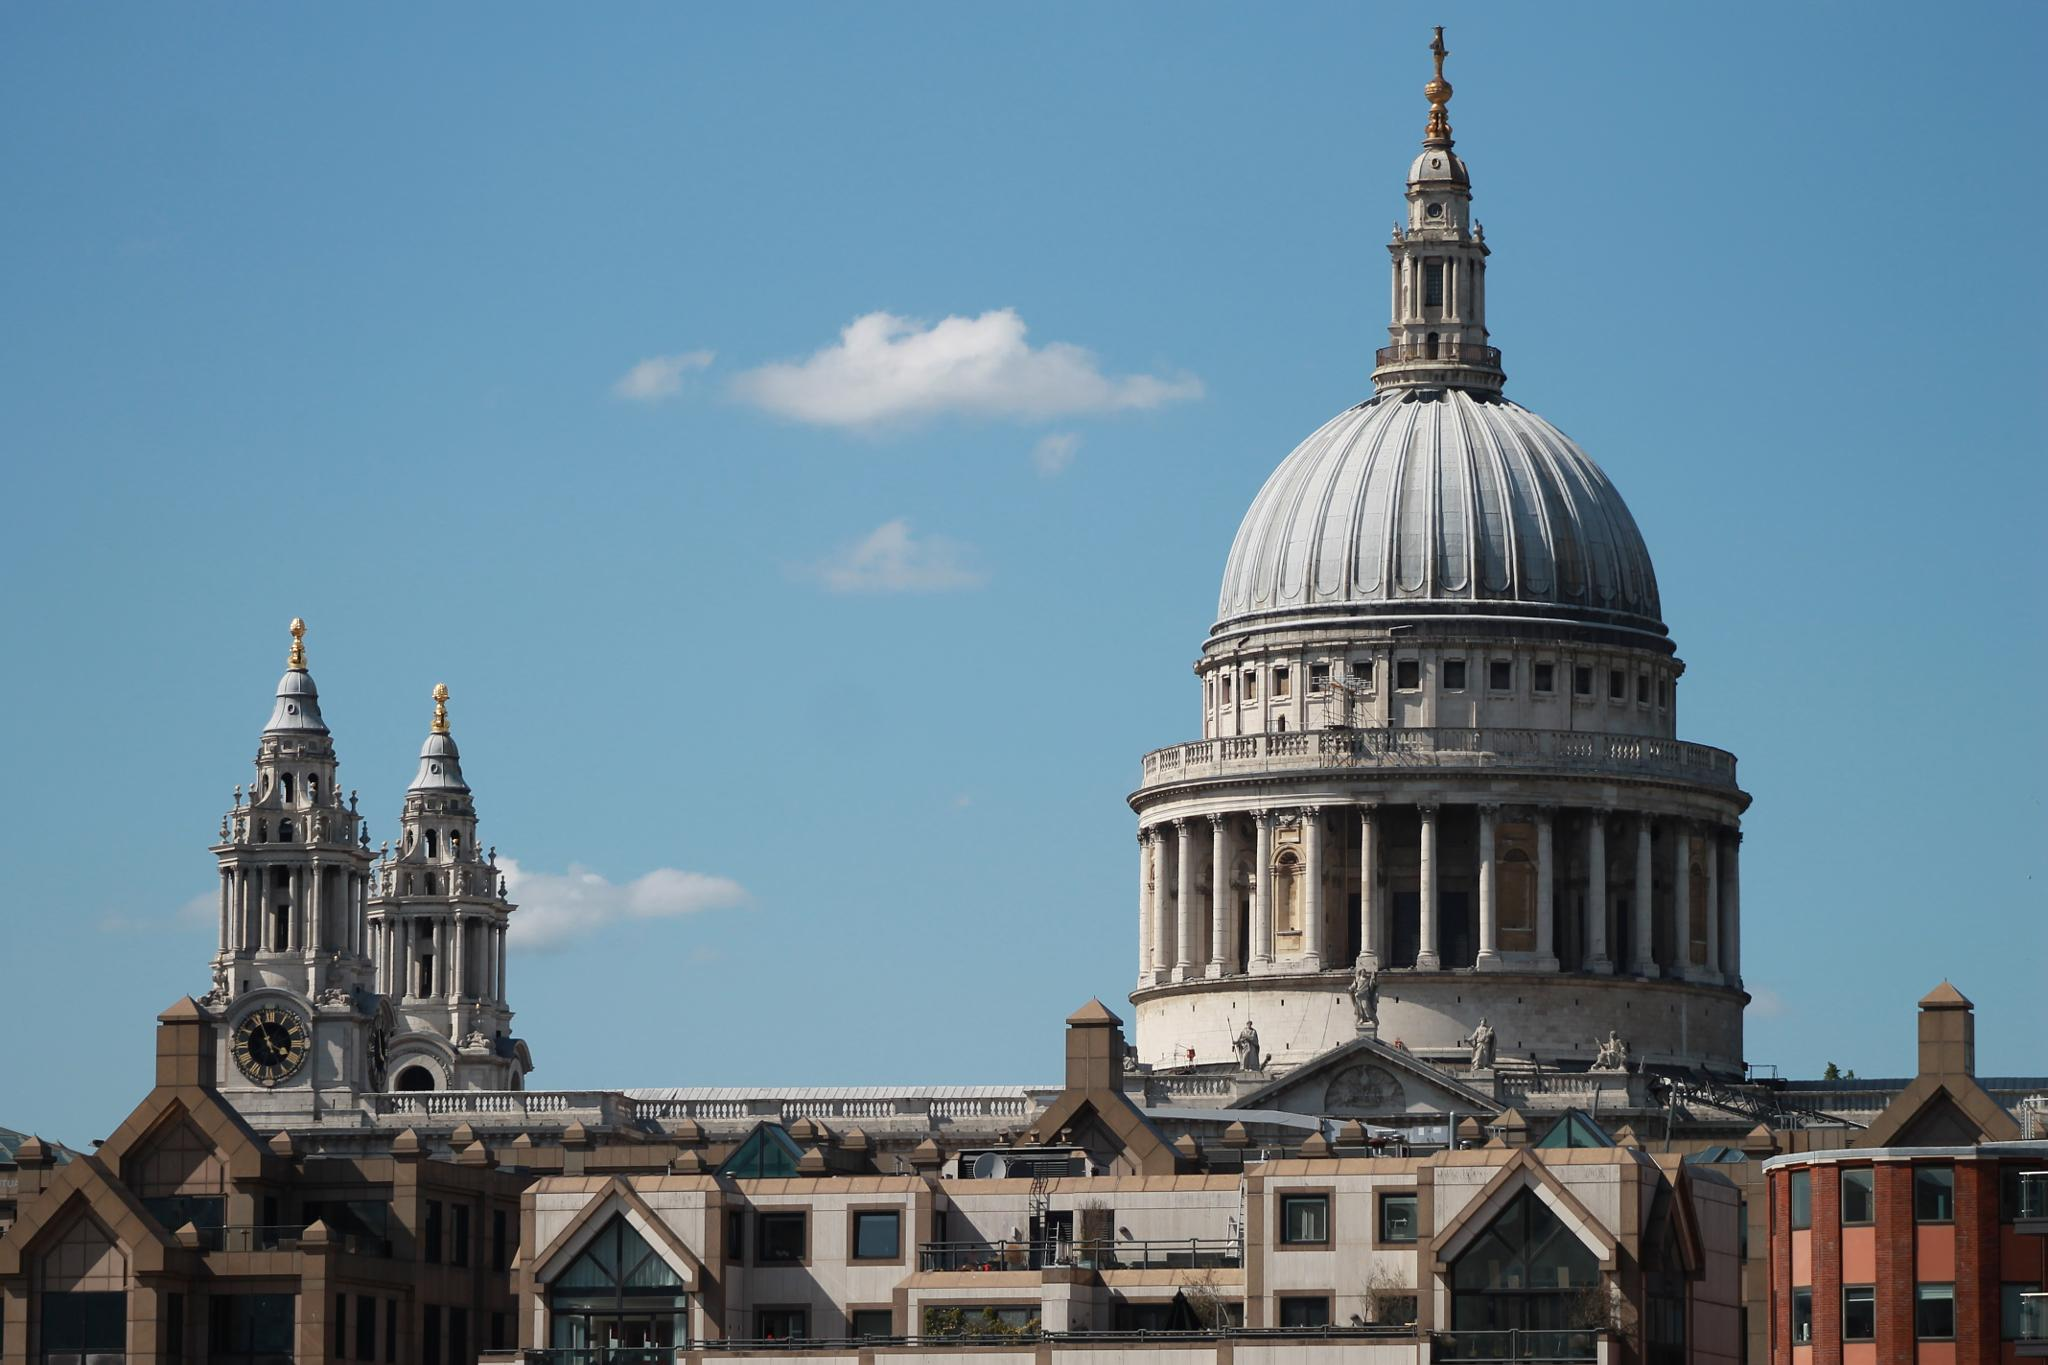 St Pauls Dome by mark.ascott.5